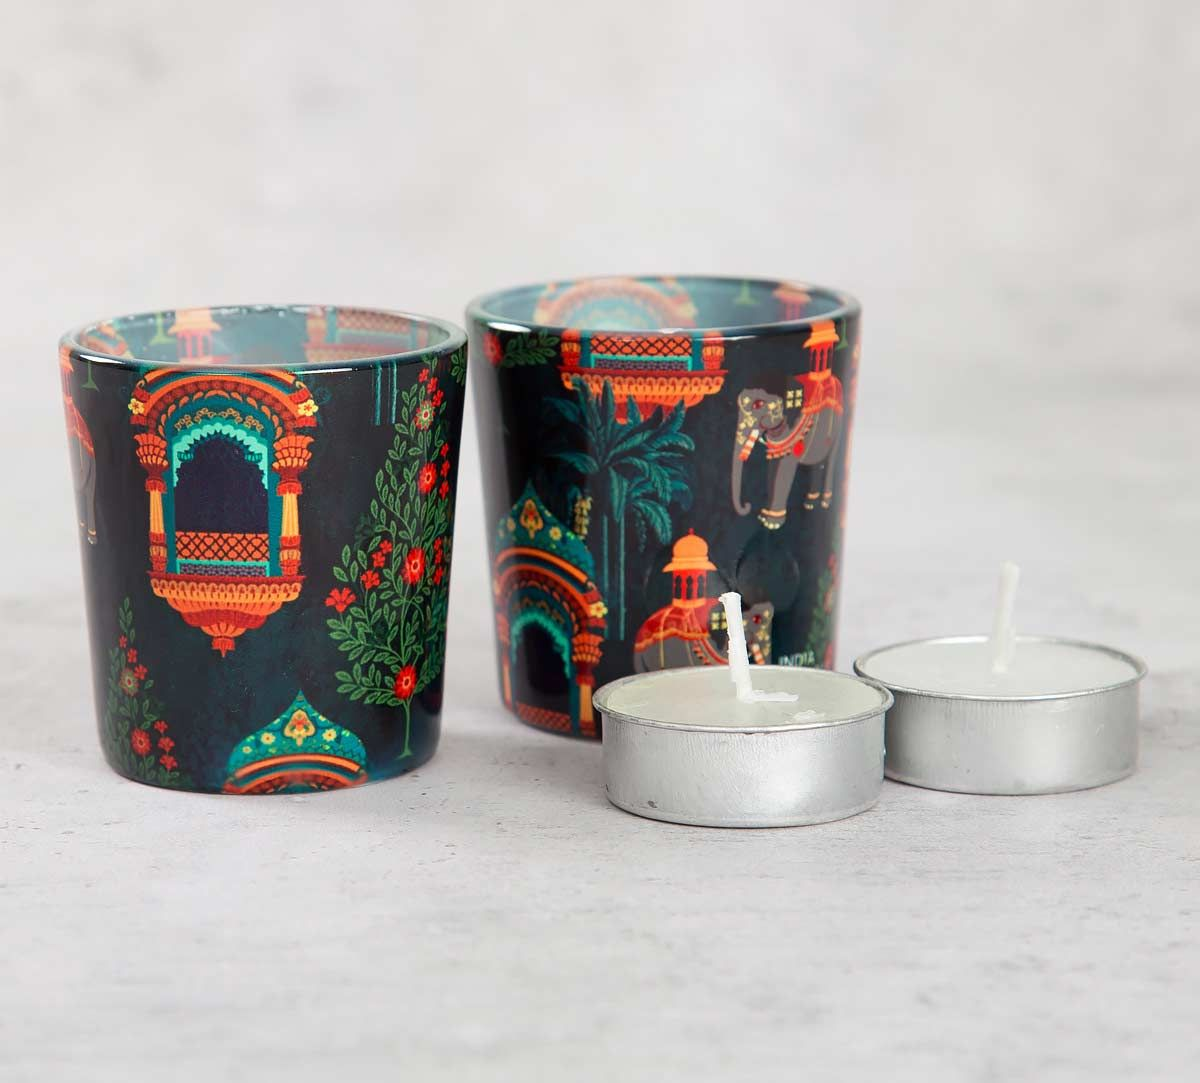 India Circus Sovereign Cavaliers Tea Light Holder Set of 2